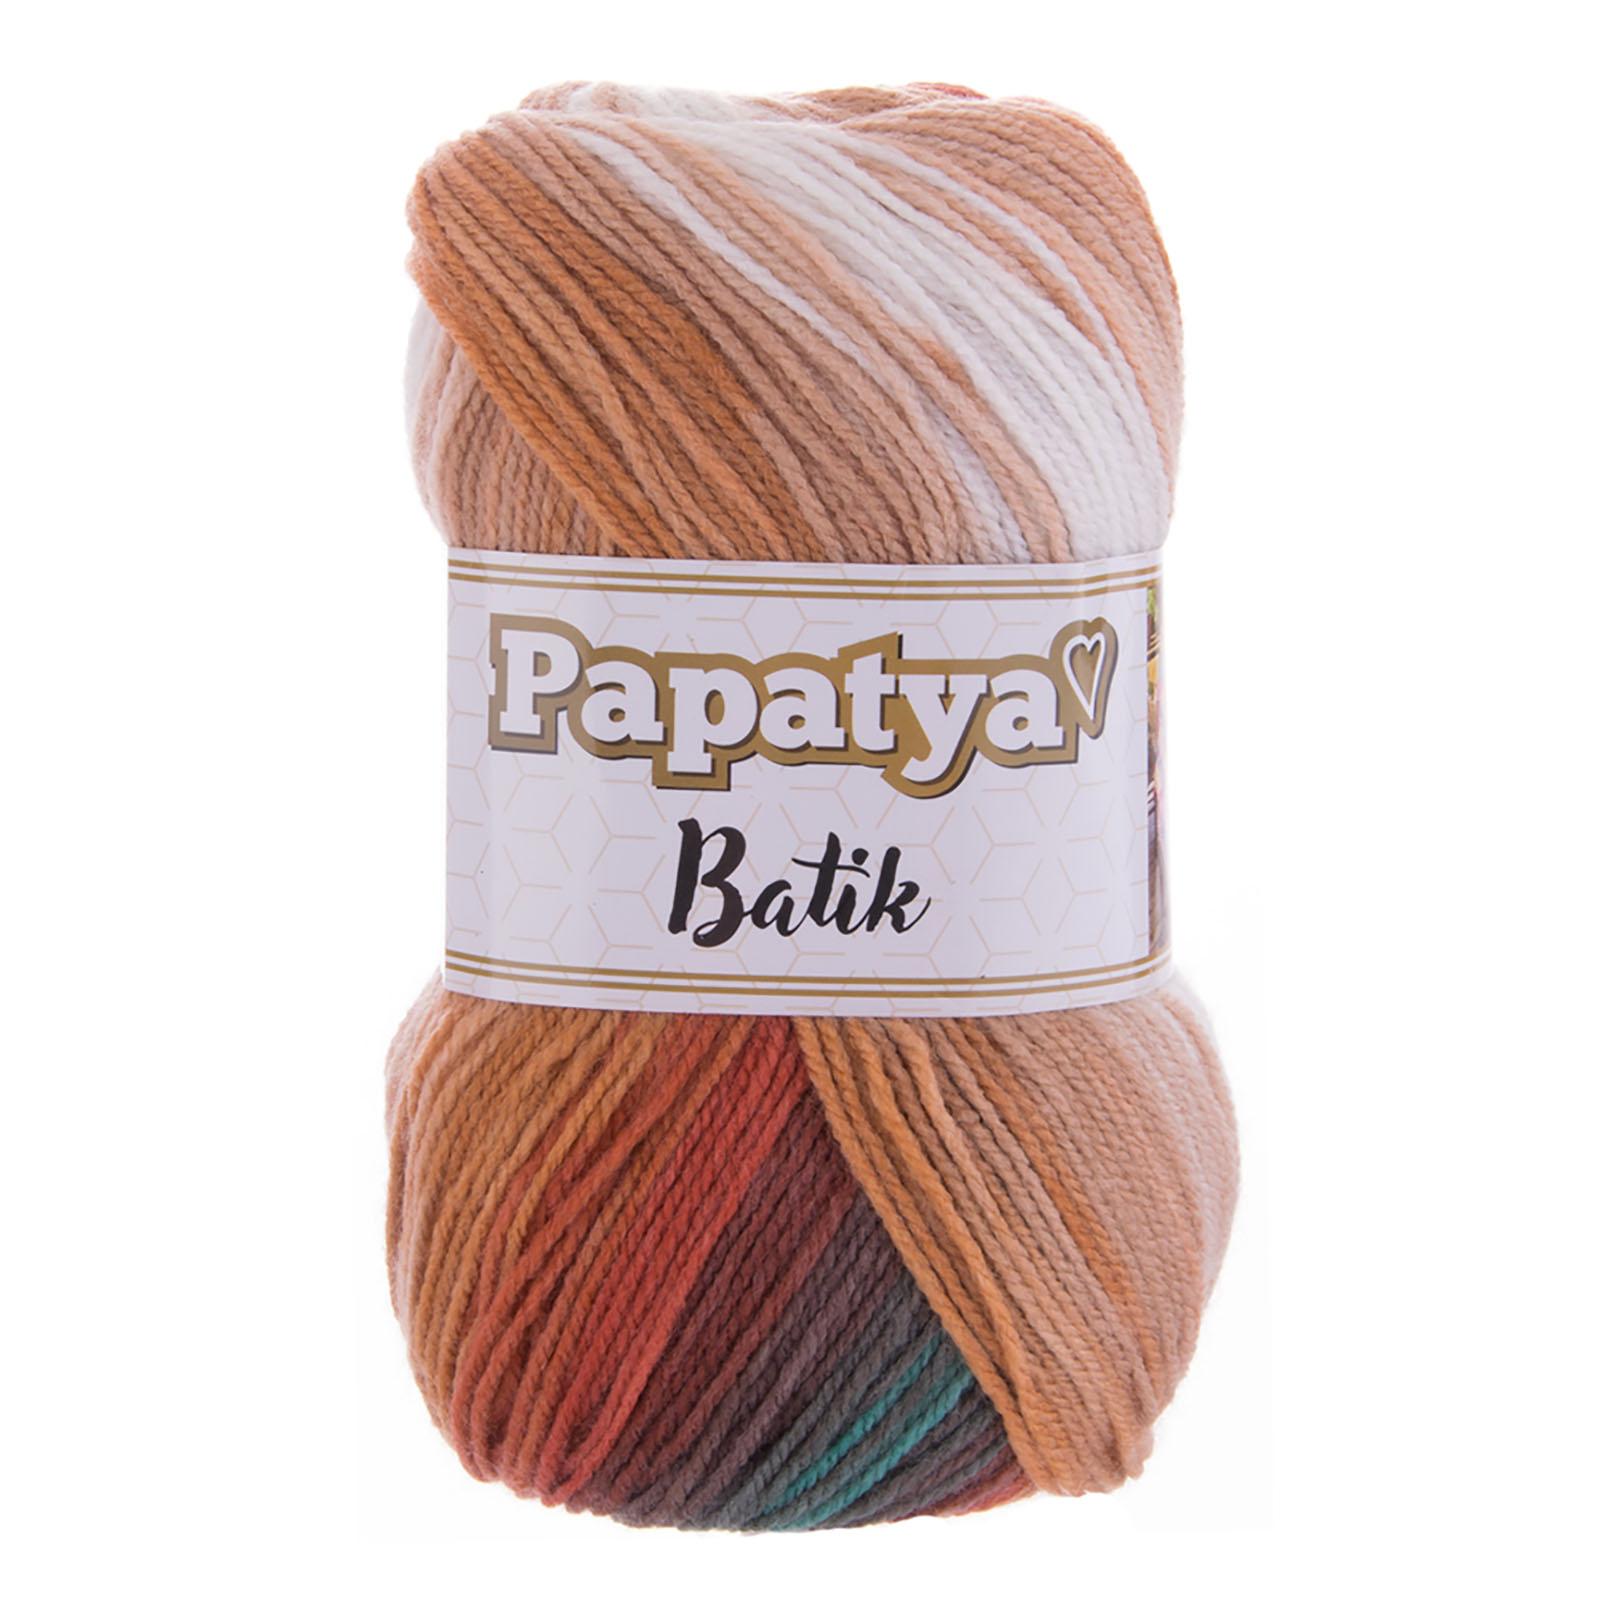 100g Farbverlaufsgarn Papatya Batik Strick-Wolle Strickgarn Häkelgarn Farbwahl – Bild 2